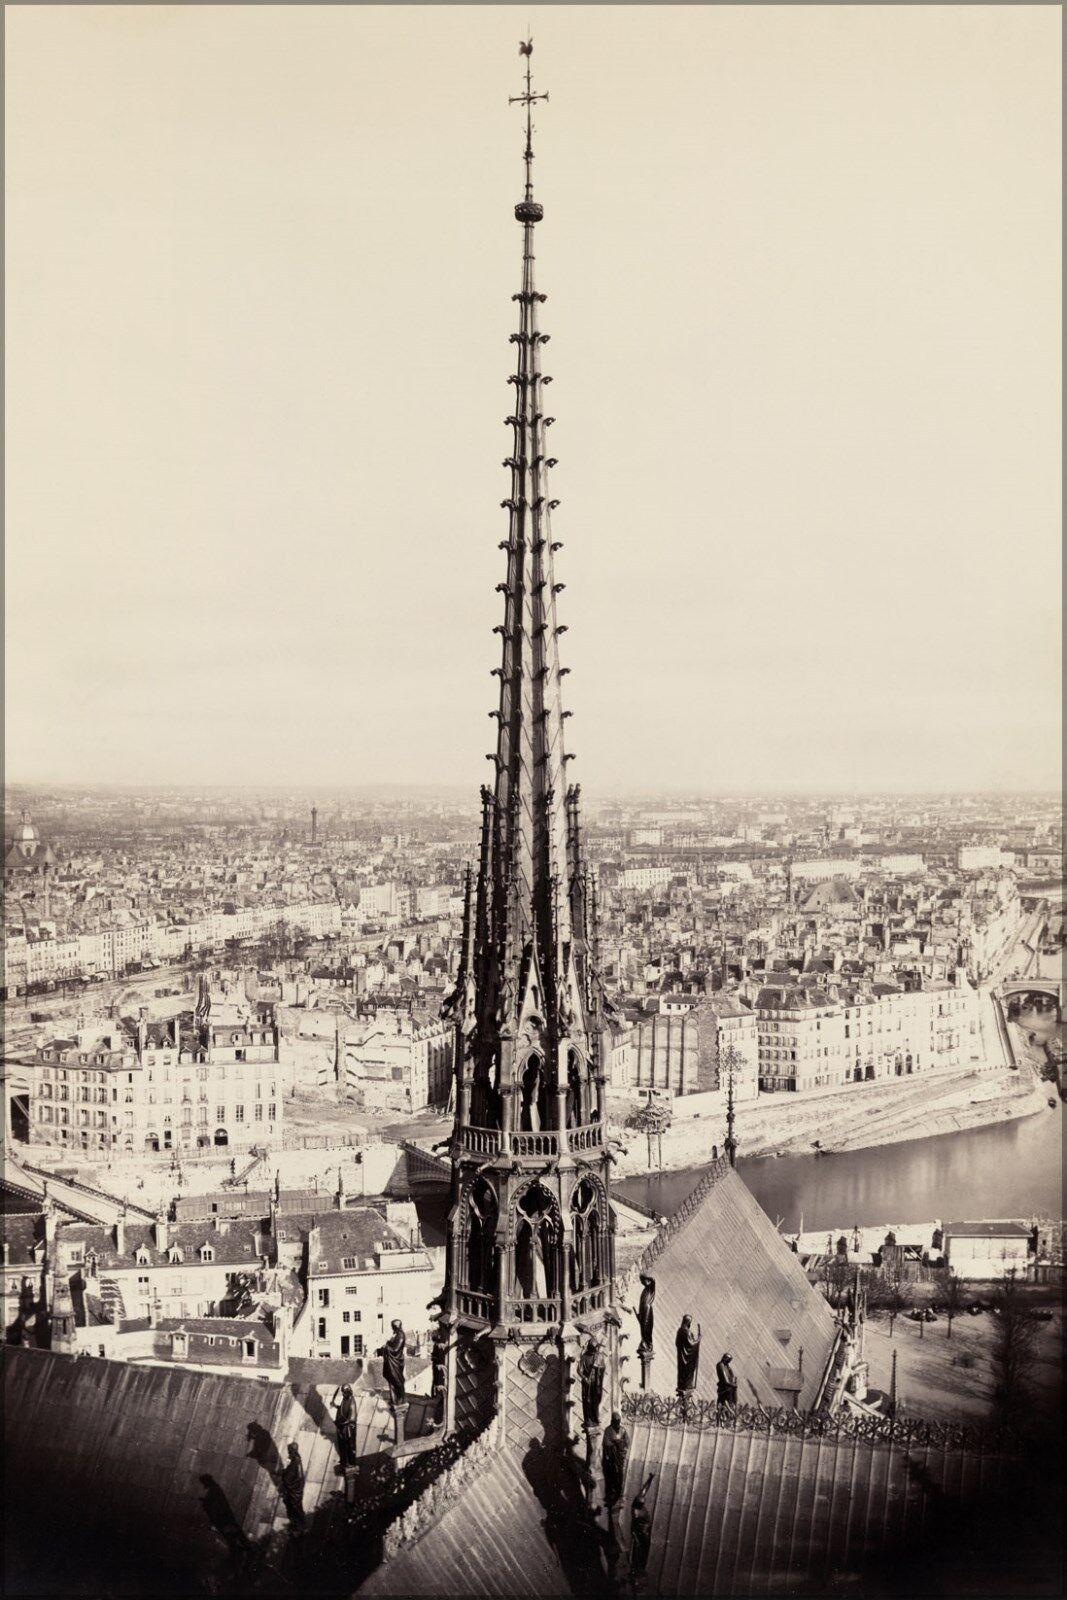 Poster, Many Größes; Notre Dame, Paris, France 1859